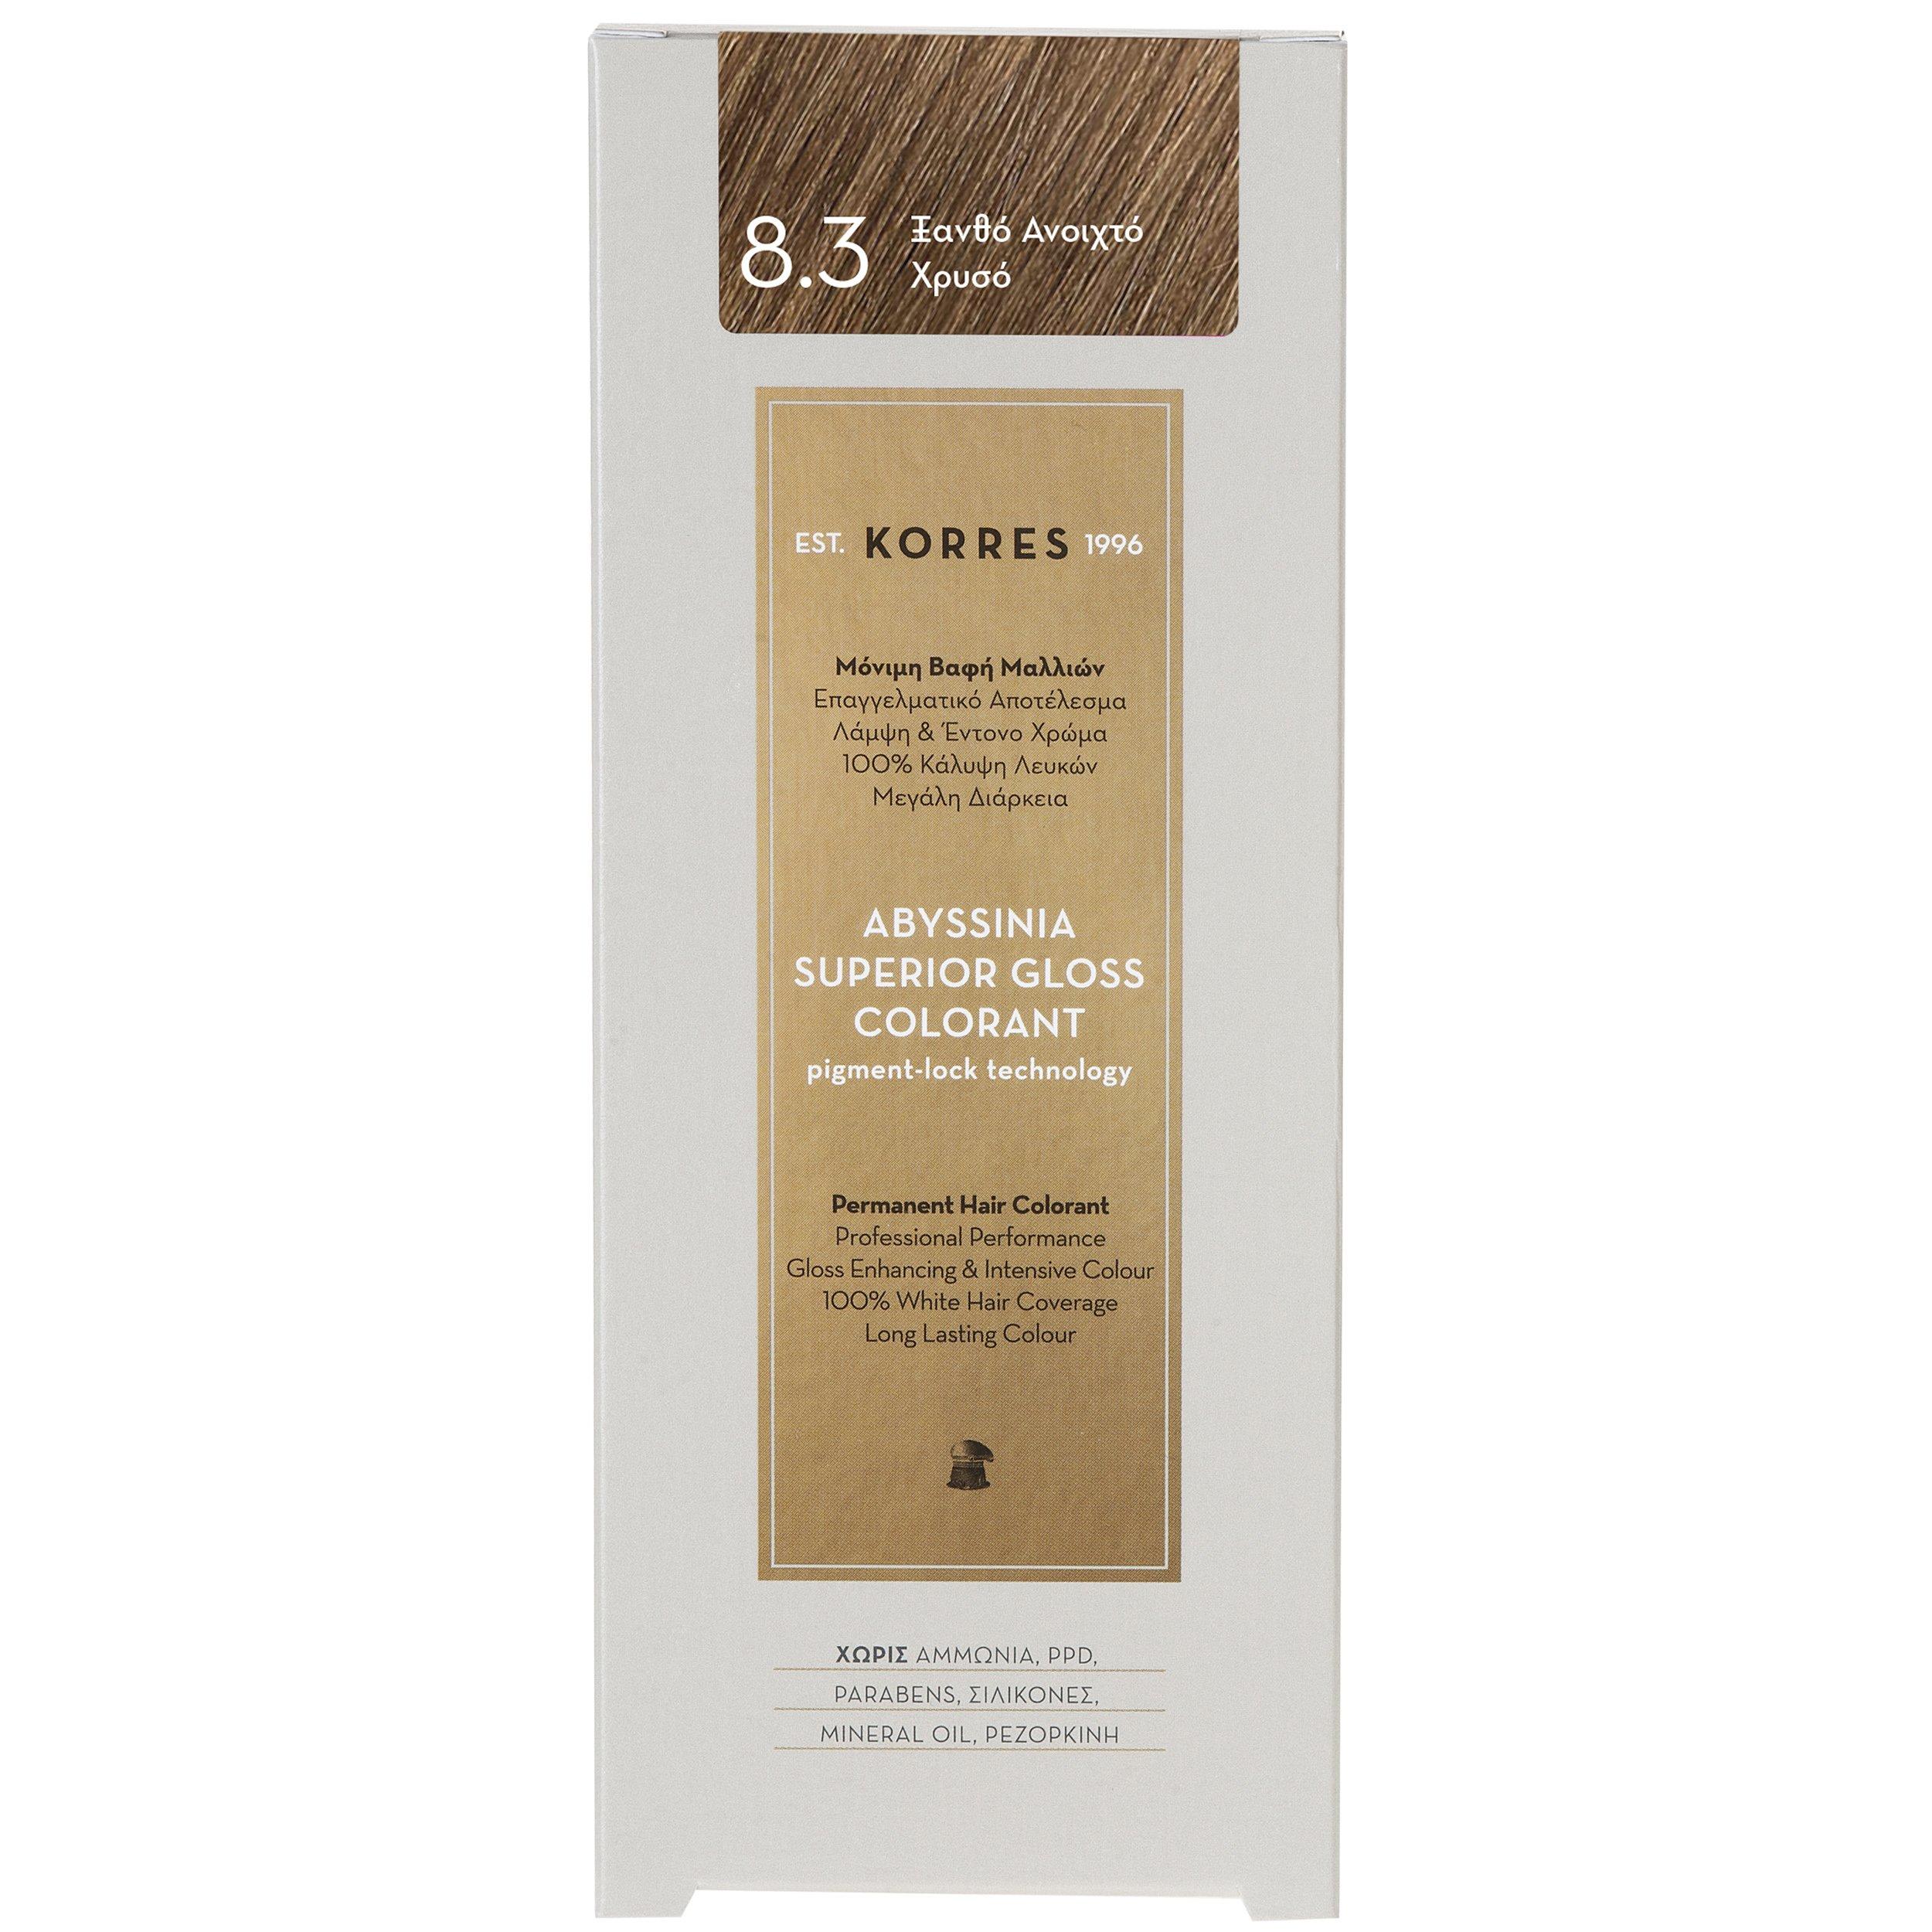 Korres Abyssinia Superior Gloss Colorant Επαγγελματικό Αποτέλεσμα Λάμψη & Έντονο Χρώμα – 8.3 ΞΑΝΘΟ ΑΝΟΙΚΤΟ ΧΡΥΣΟ